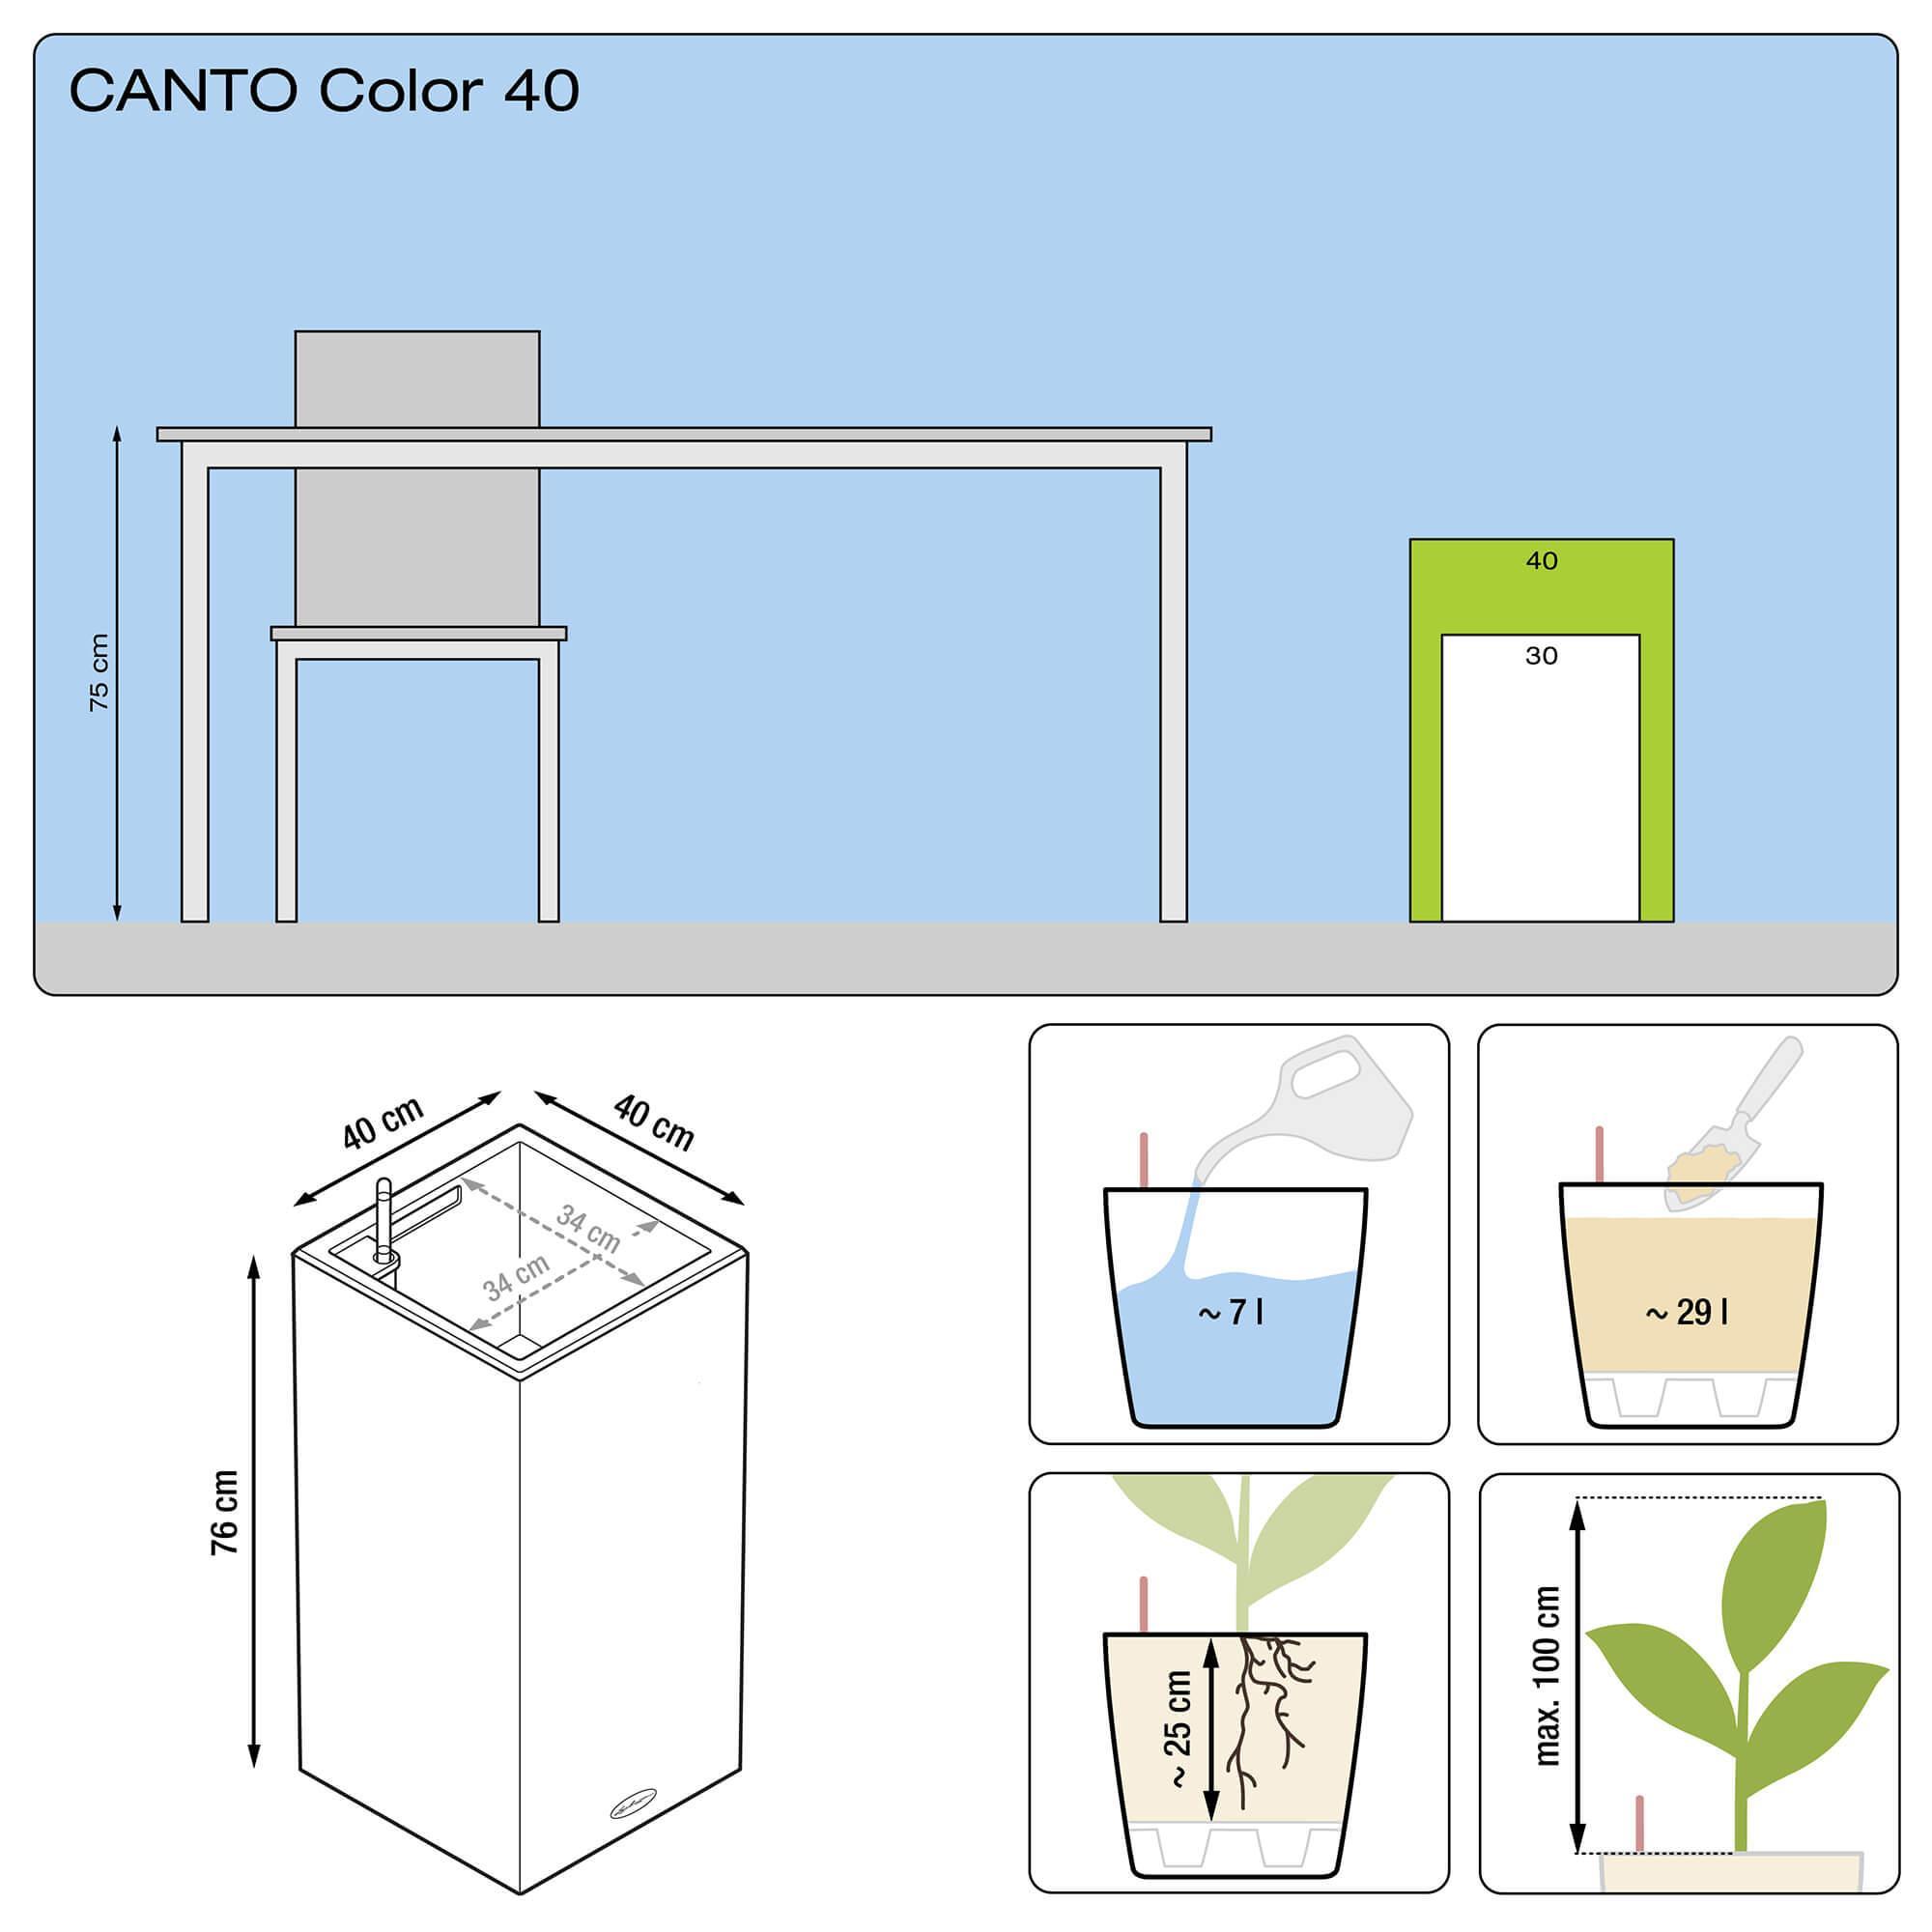 CANTO Color column 40 stone gray - Image 3